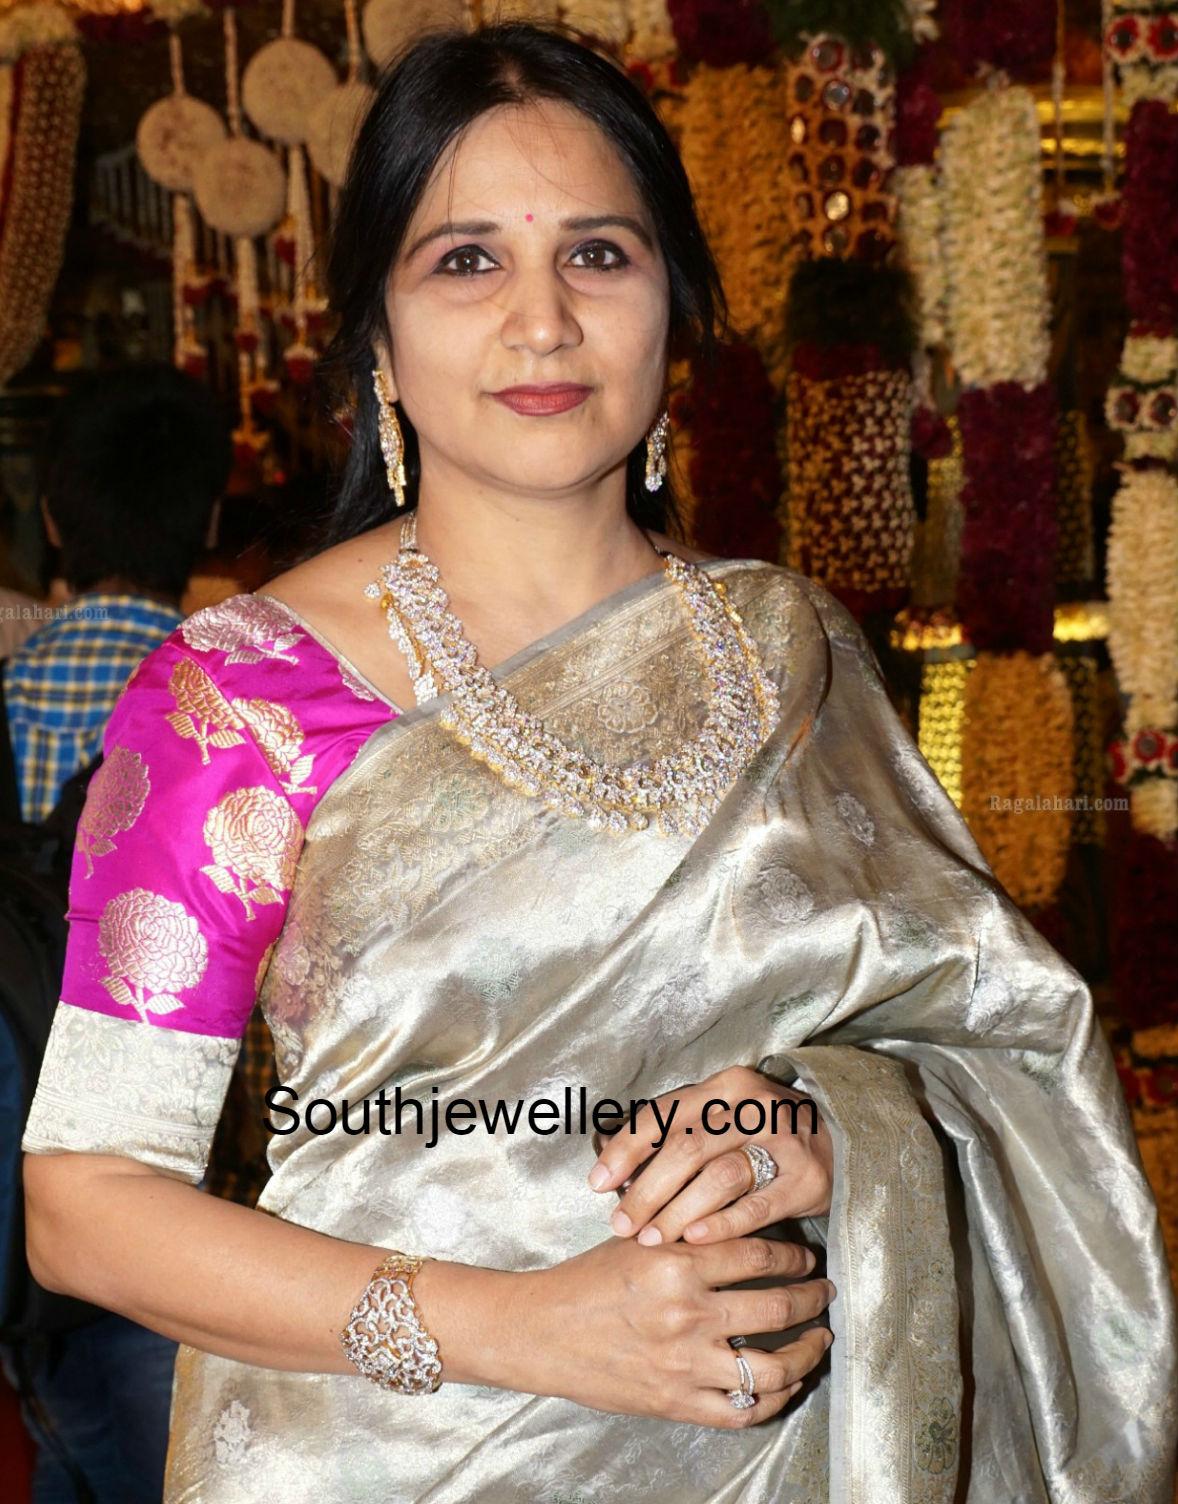 Suhasini in gundla haram jewellery designs - Socialite In Diamond Jewelry Socialite In Diamond Jewelry